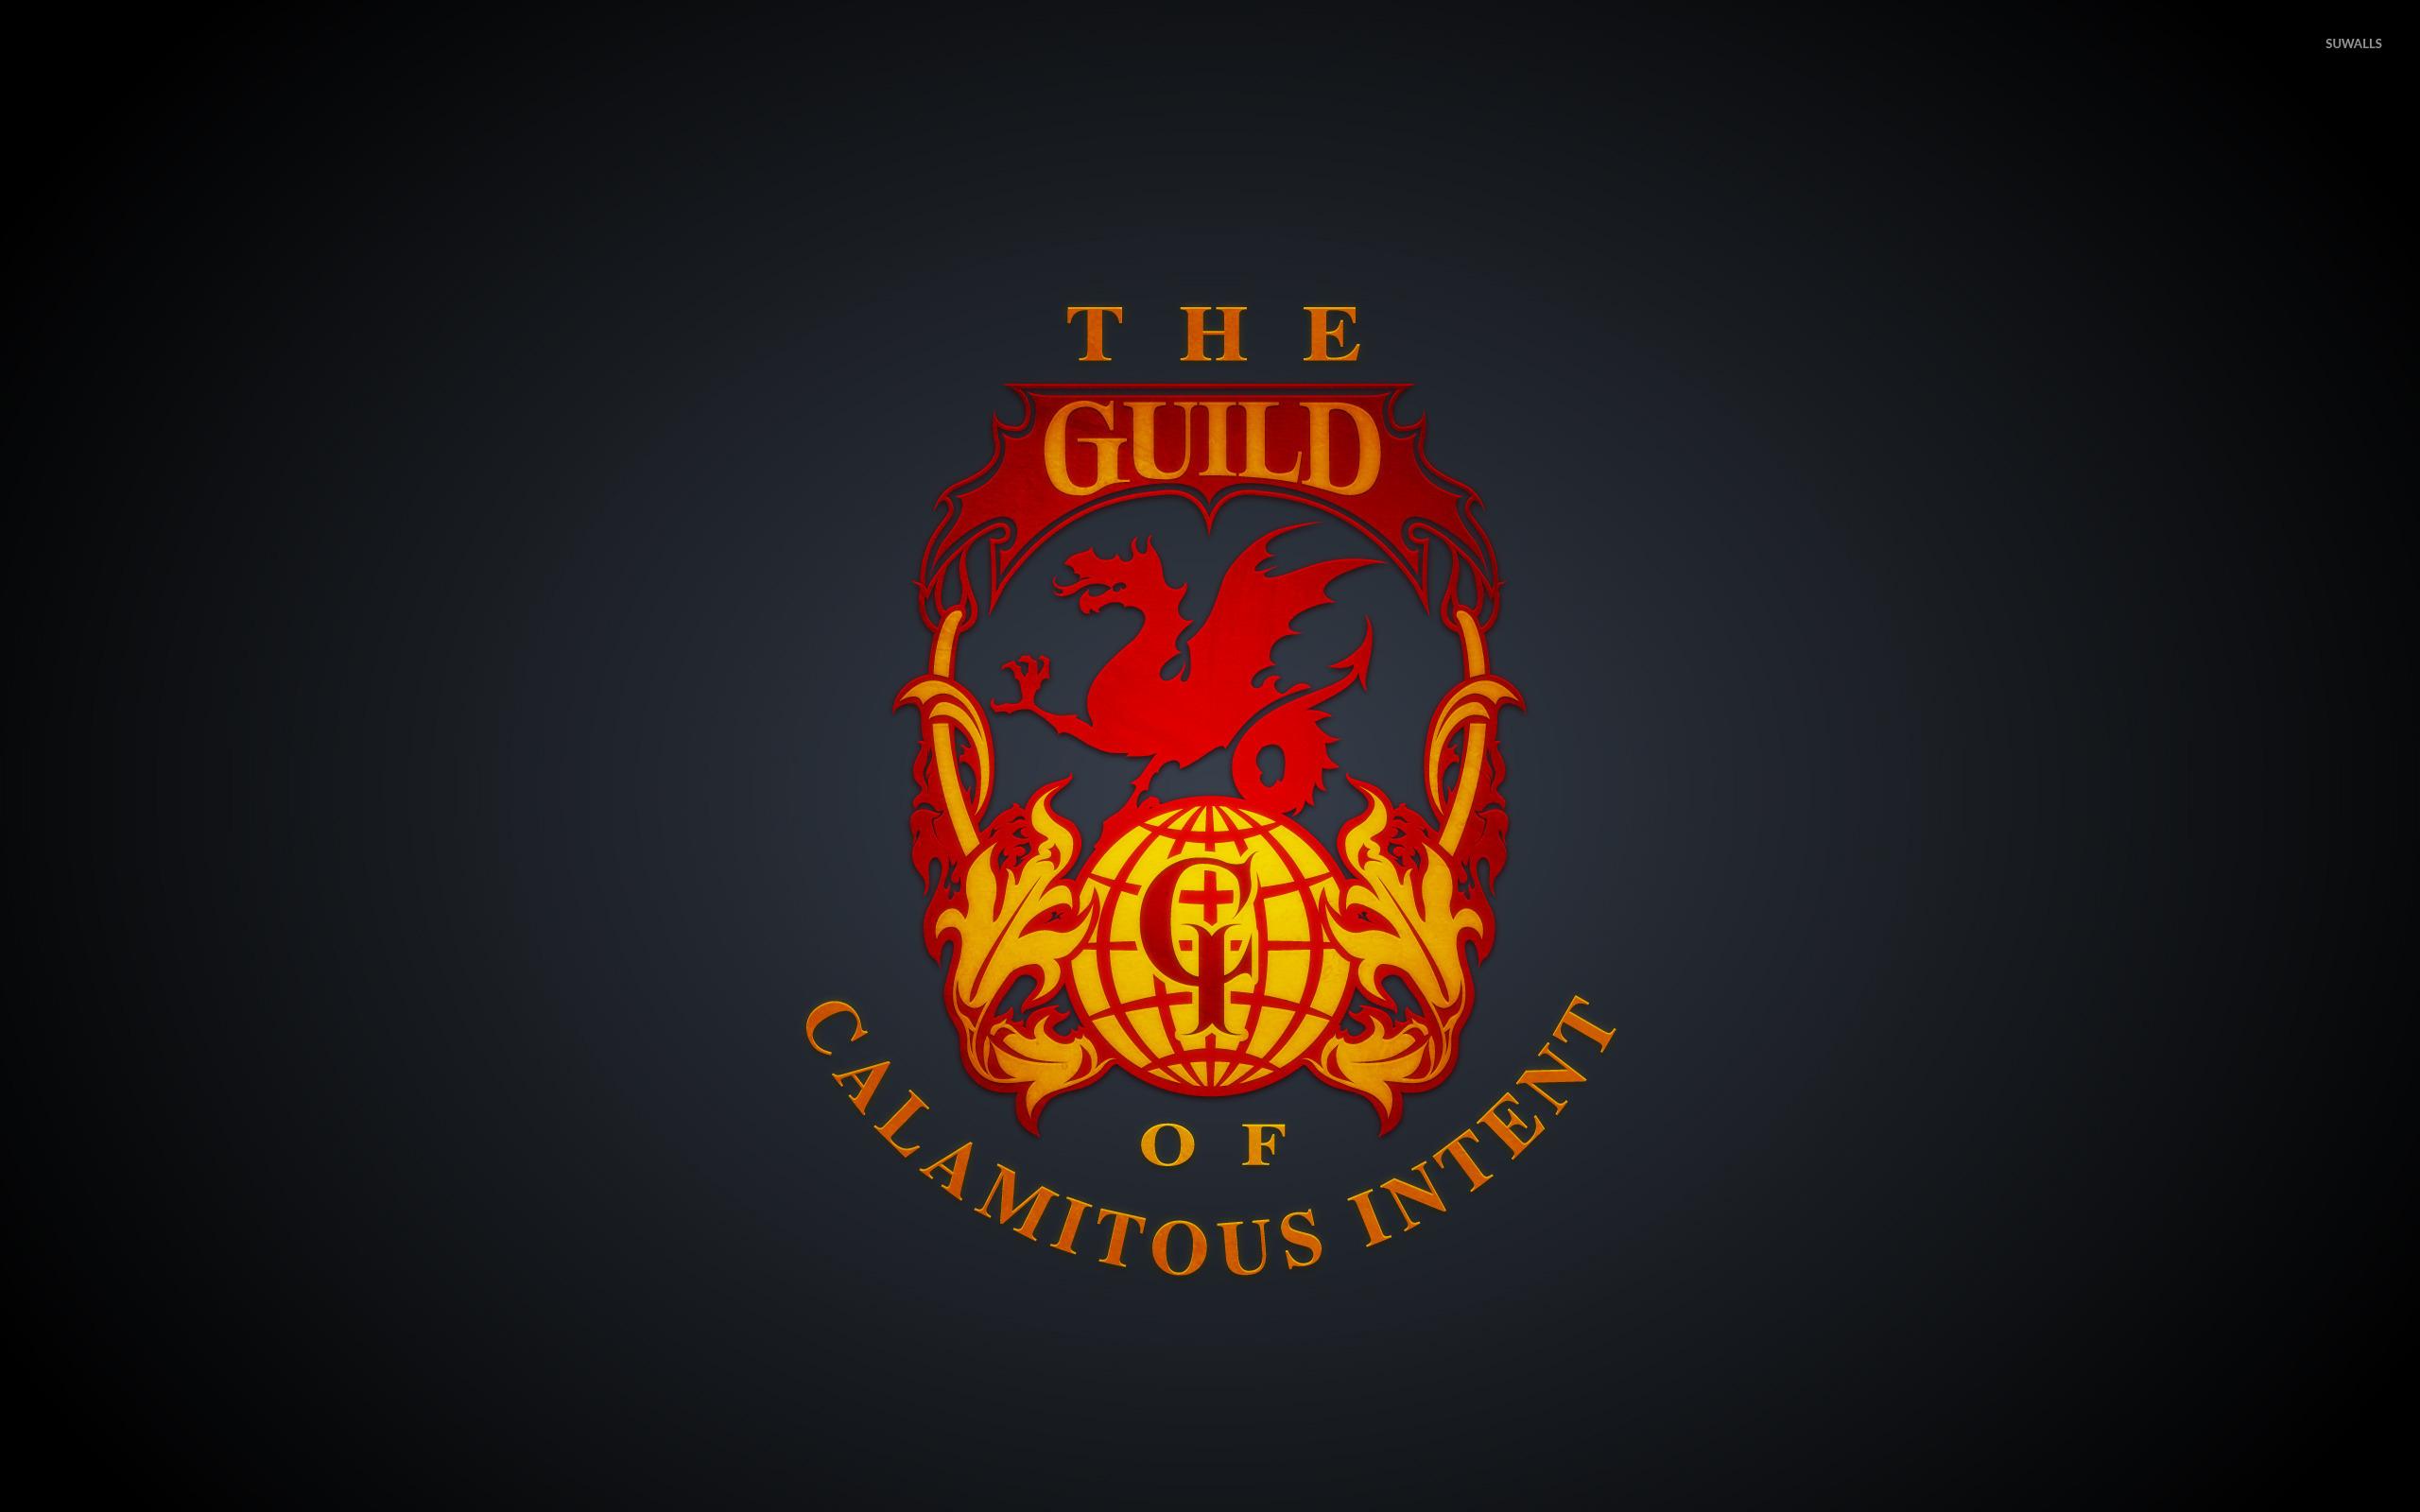 Wallpaper Gravity Falls Hd The Guild Of Calamitous Intent Wallpaper Cartoon